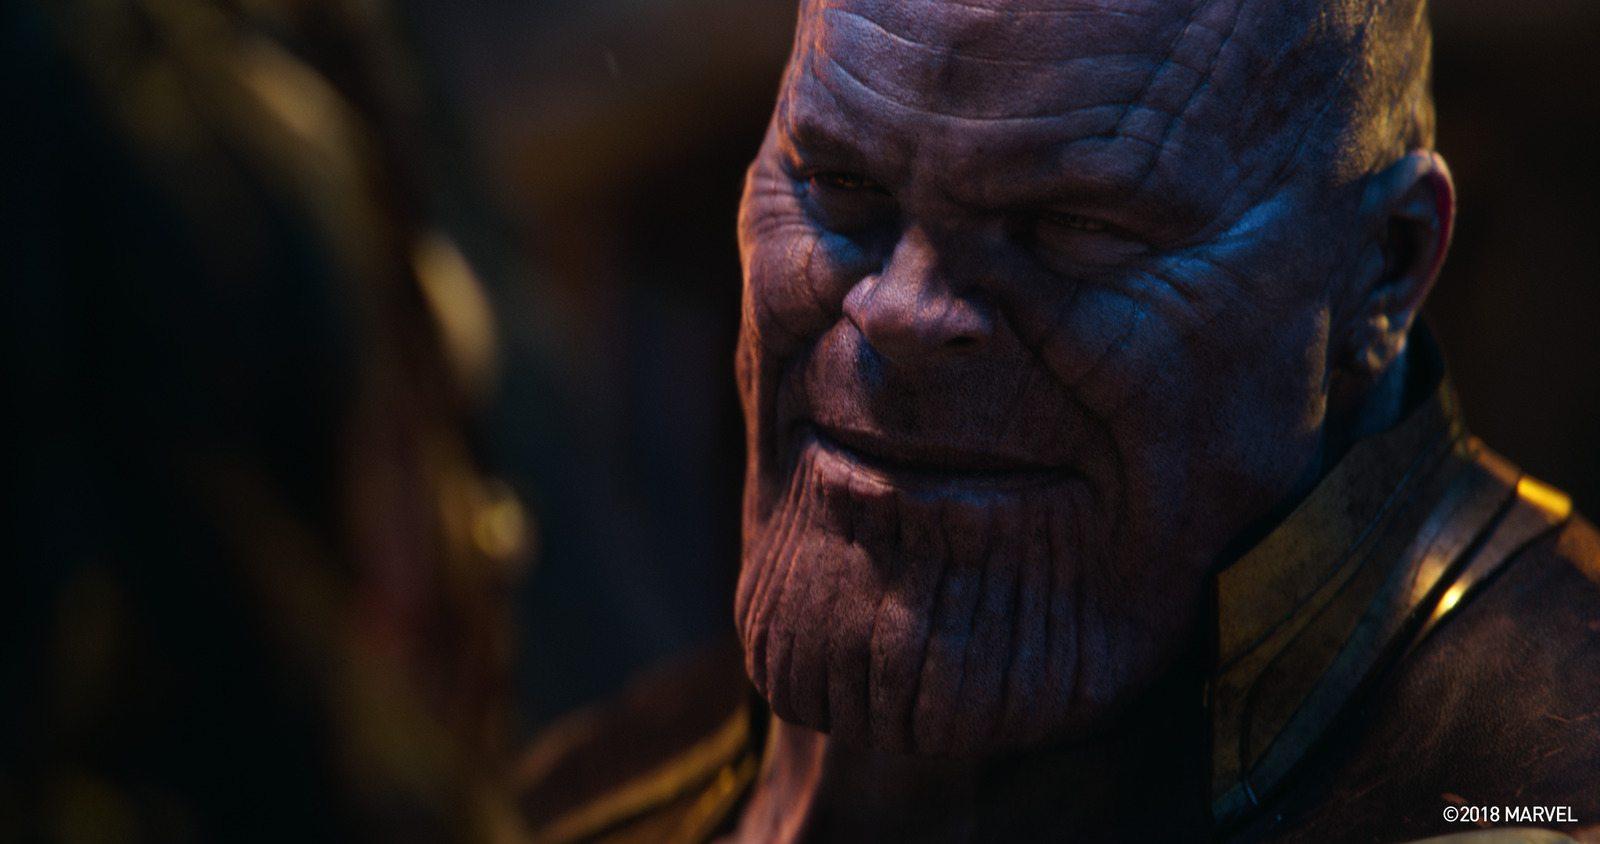 Marvel's Avengers: Infinity War Overtakes The Avengers To